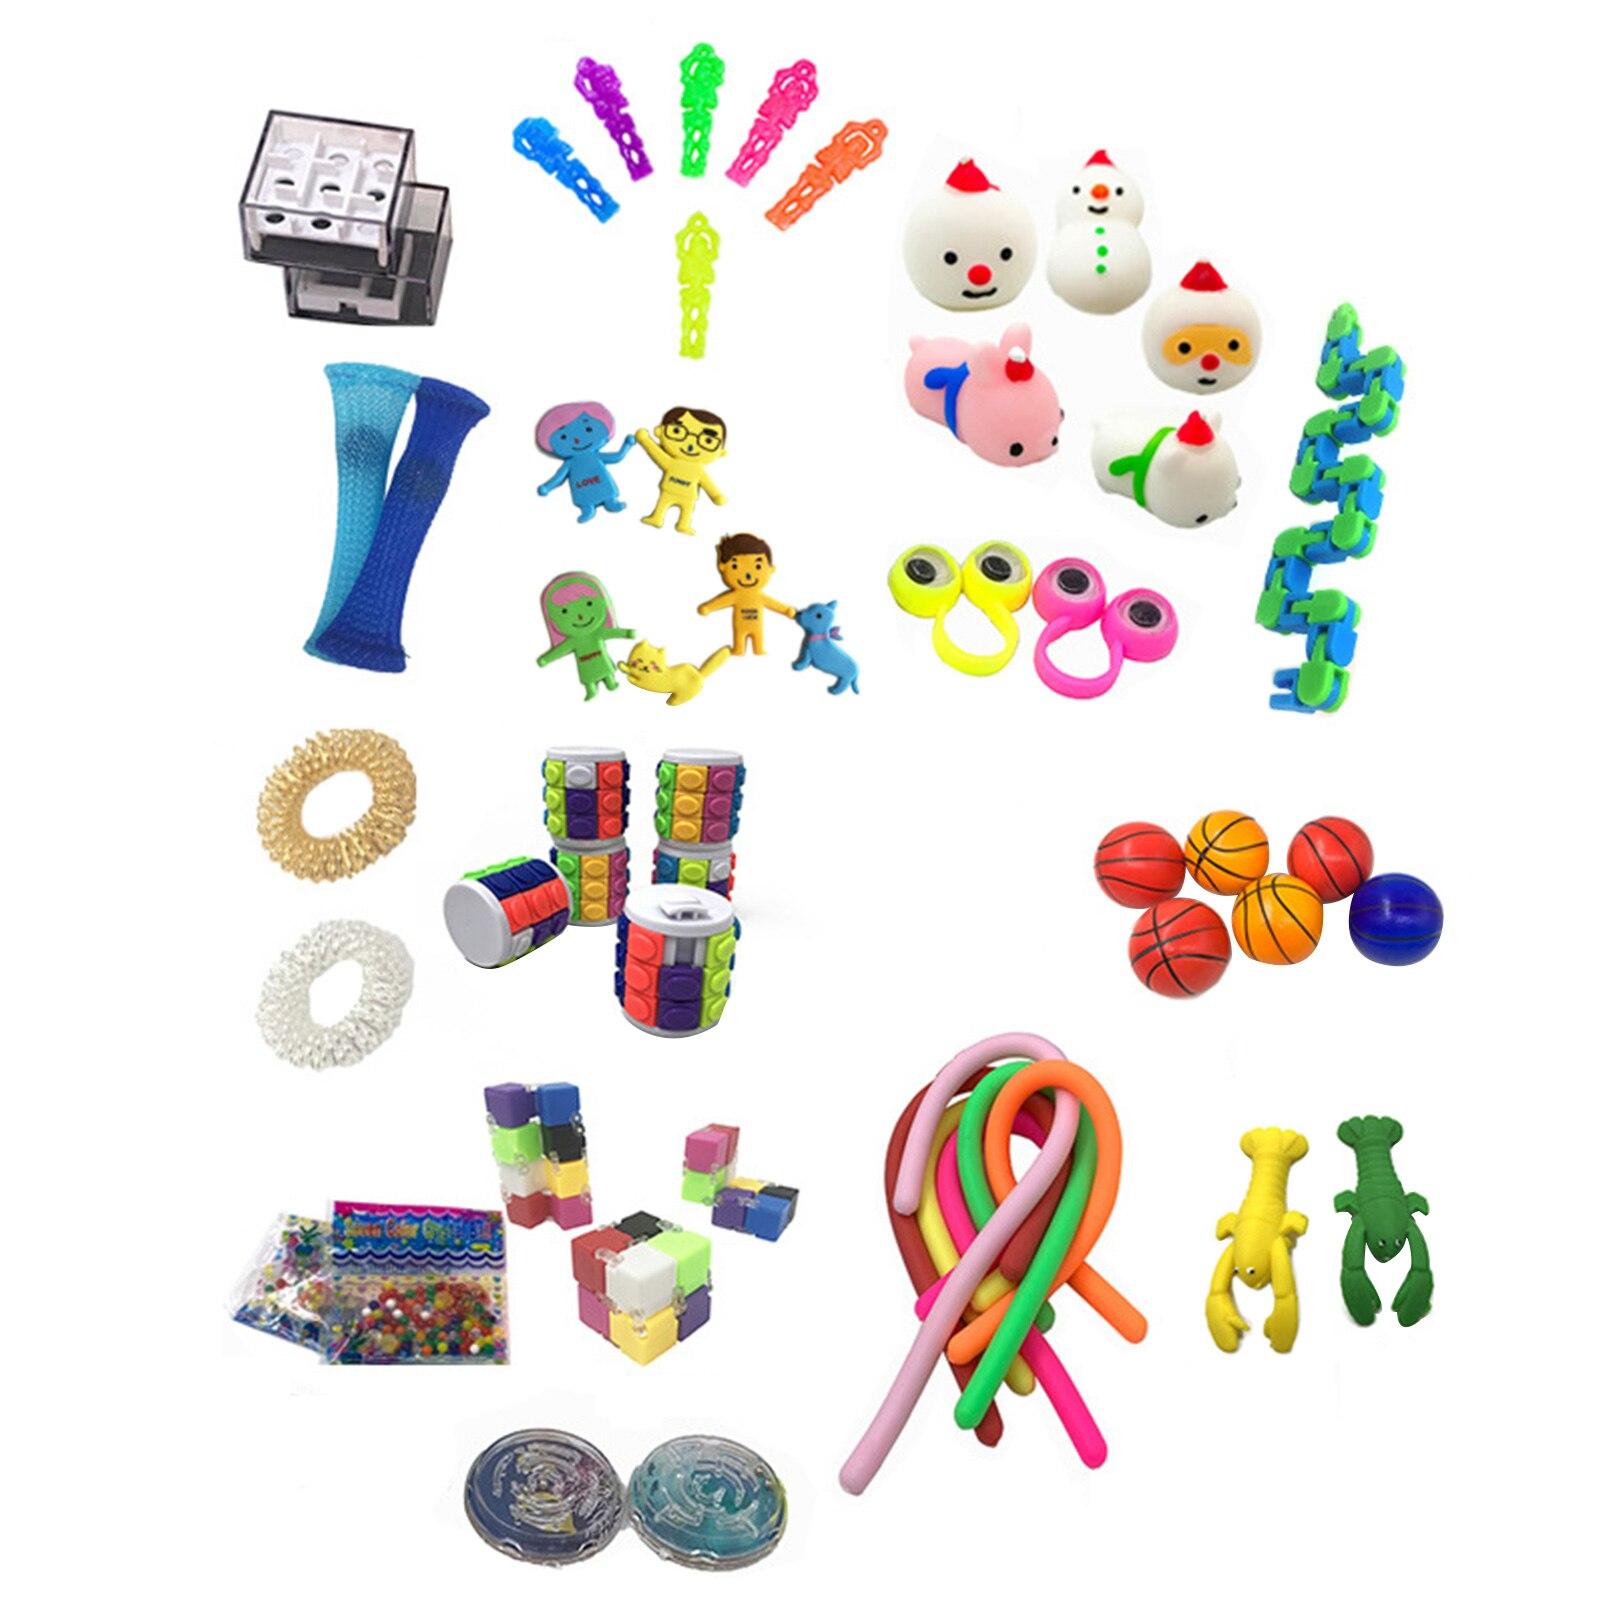 Kids Gift Set 10/50Pcs Pack Sensory Fidget Toy Set Stress Relief Toys Autism Anxiety Squishy Balls Fidget Toys For boy/girl/Kids enlarge